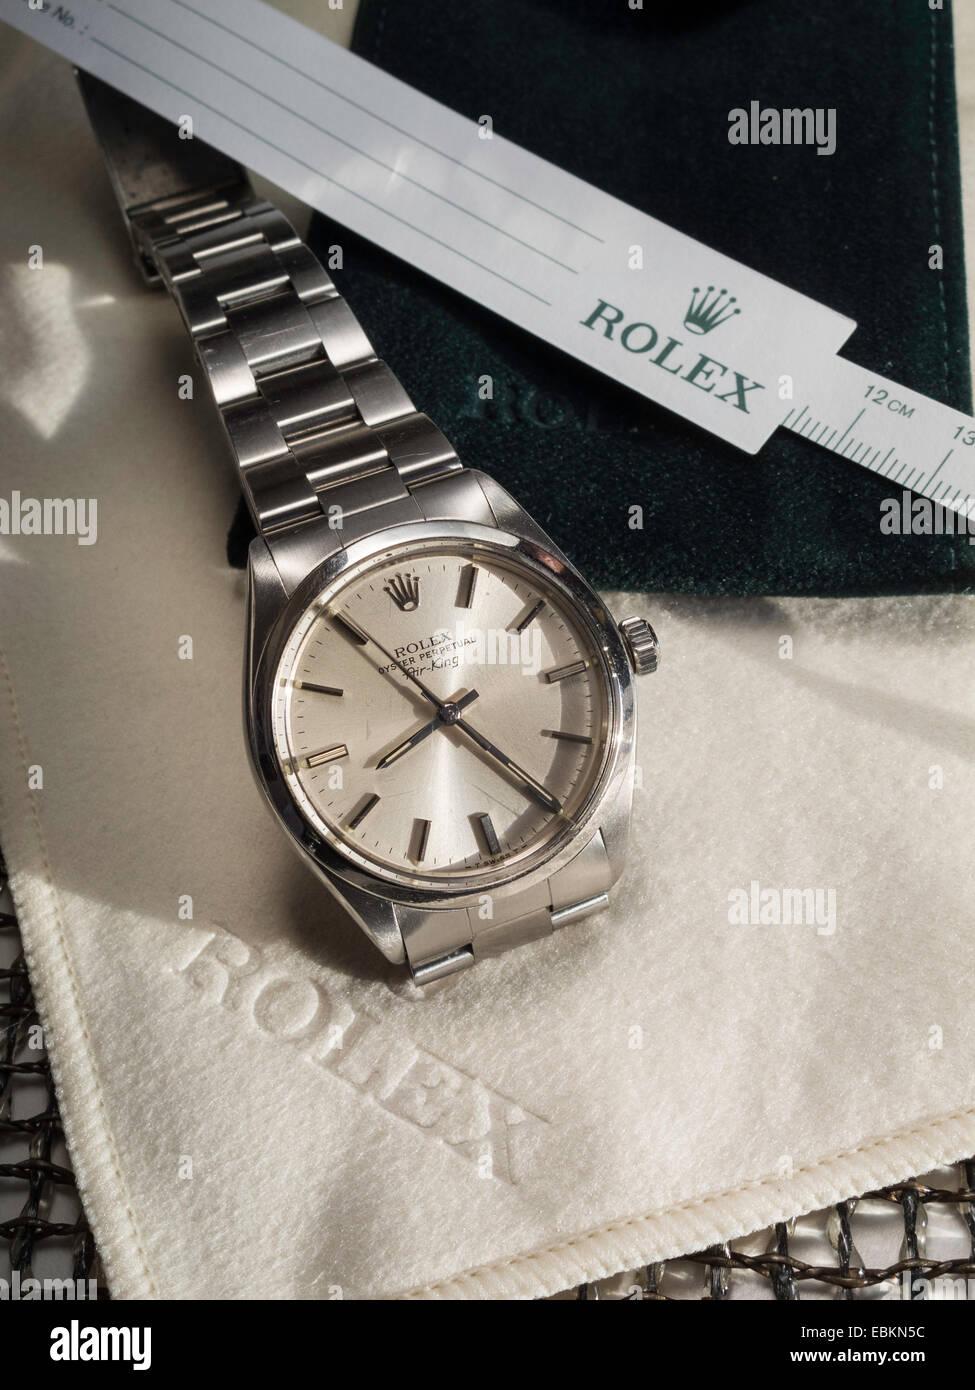 rolex wrist watch stock photos amp rolex wrist watch stock